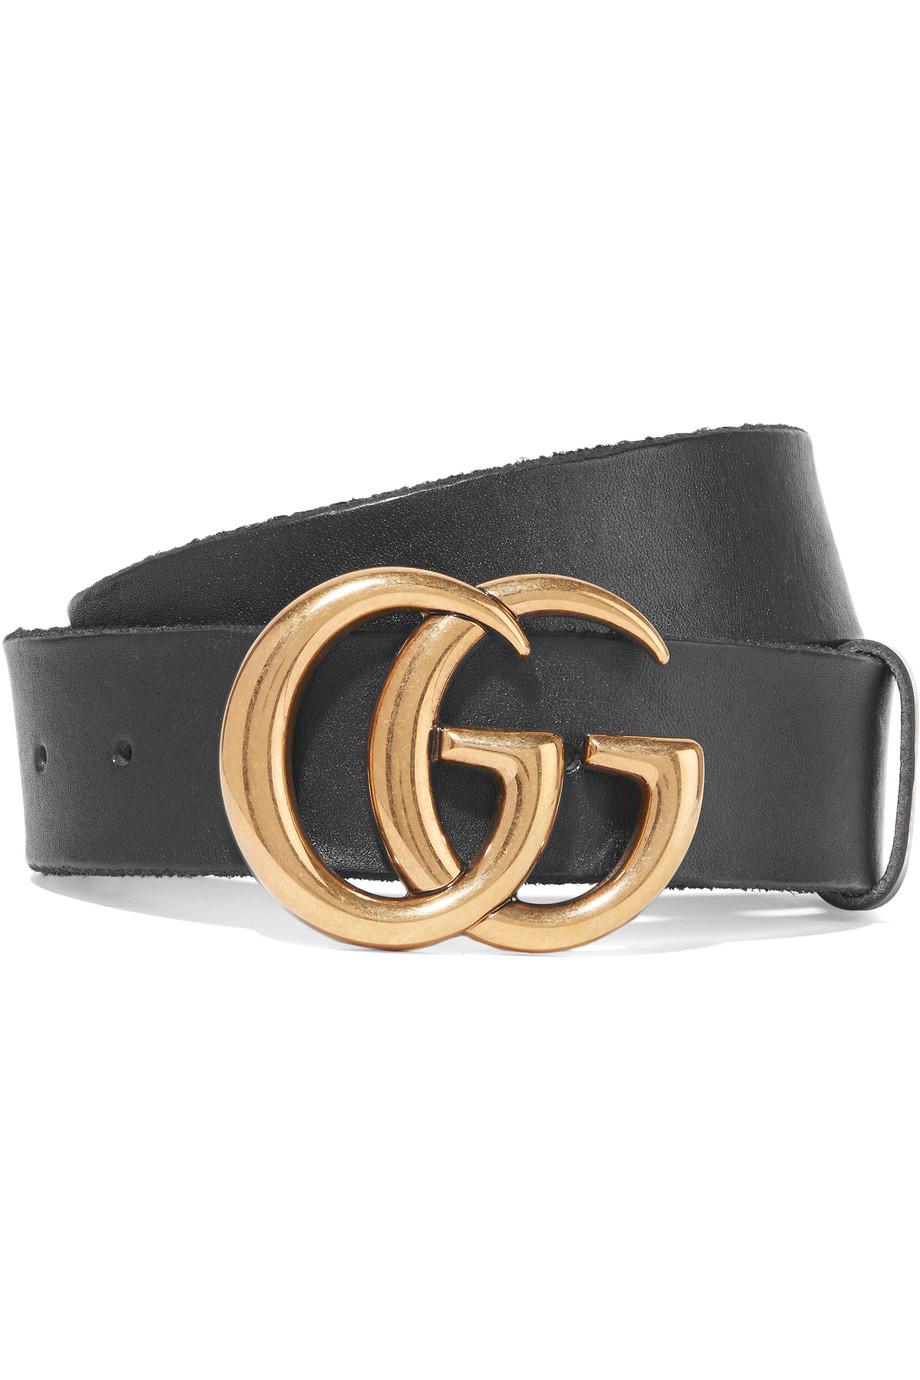 Gucci Leather Belt, Black, Women's, Size: 65